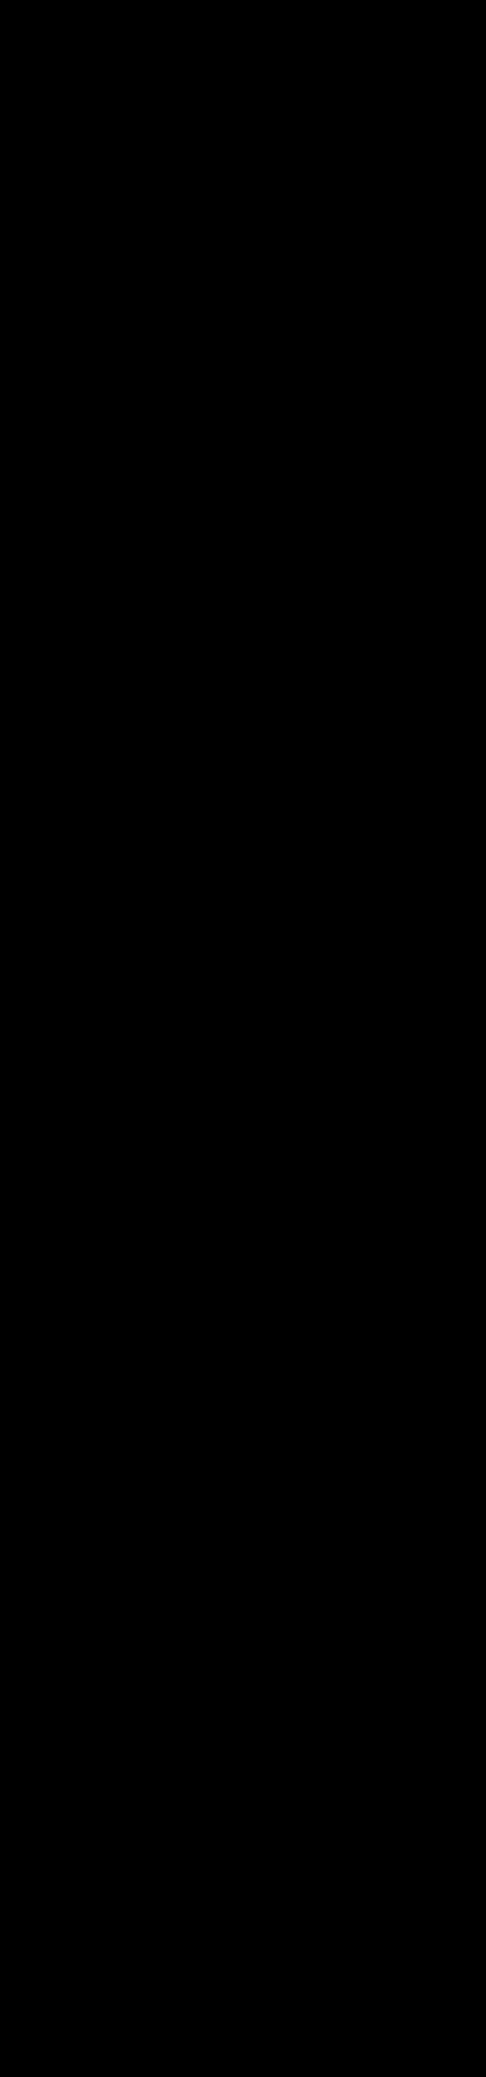 Sword clipart silhouette